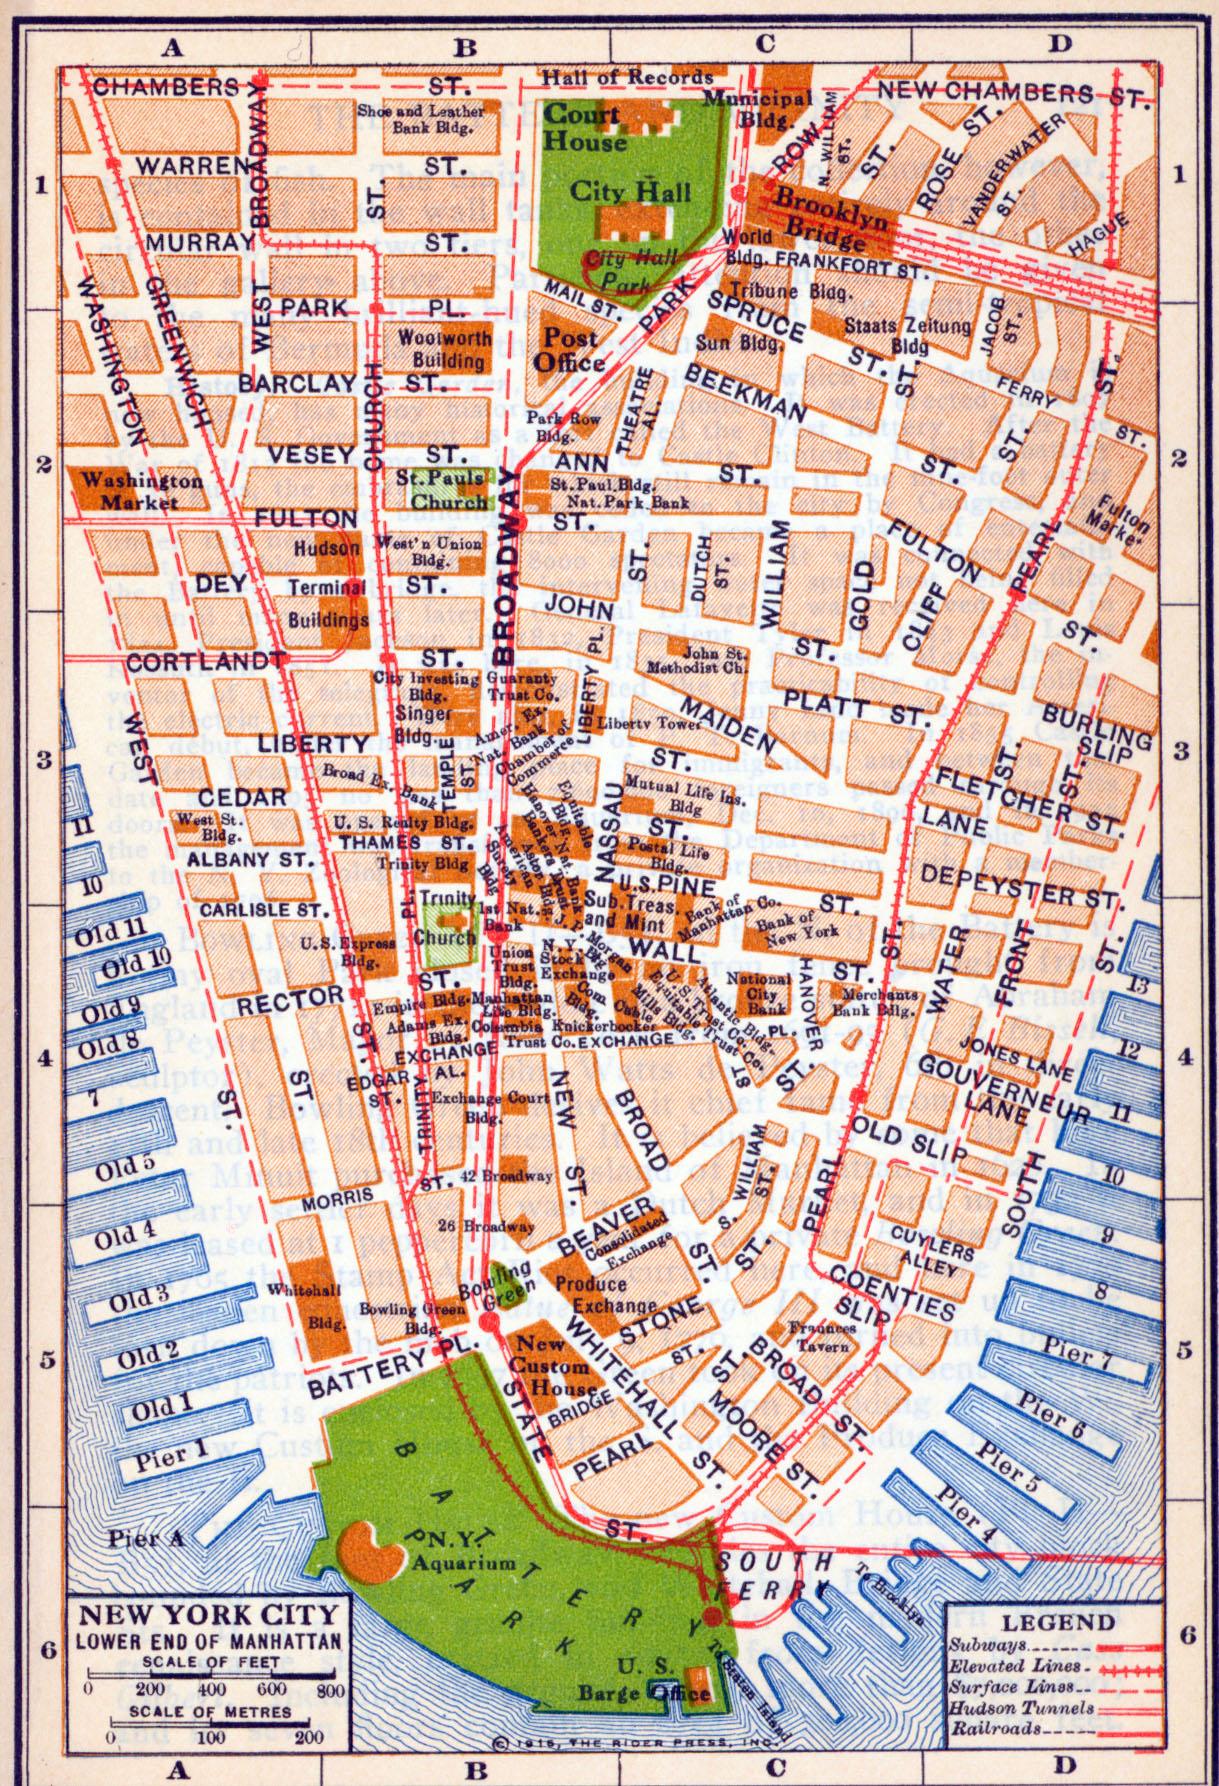 Lower End Manhattan Map, New York City, New York, United States 1916